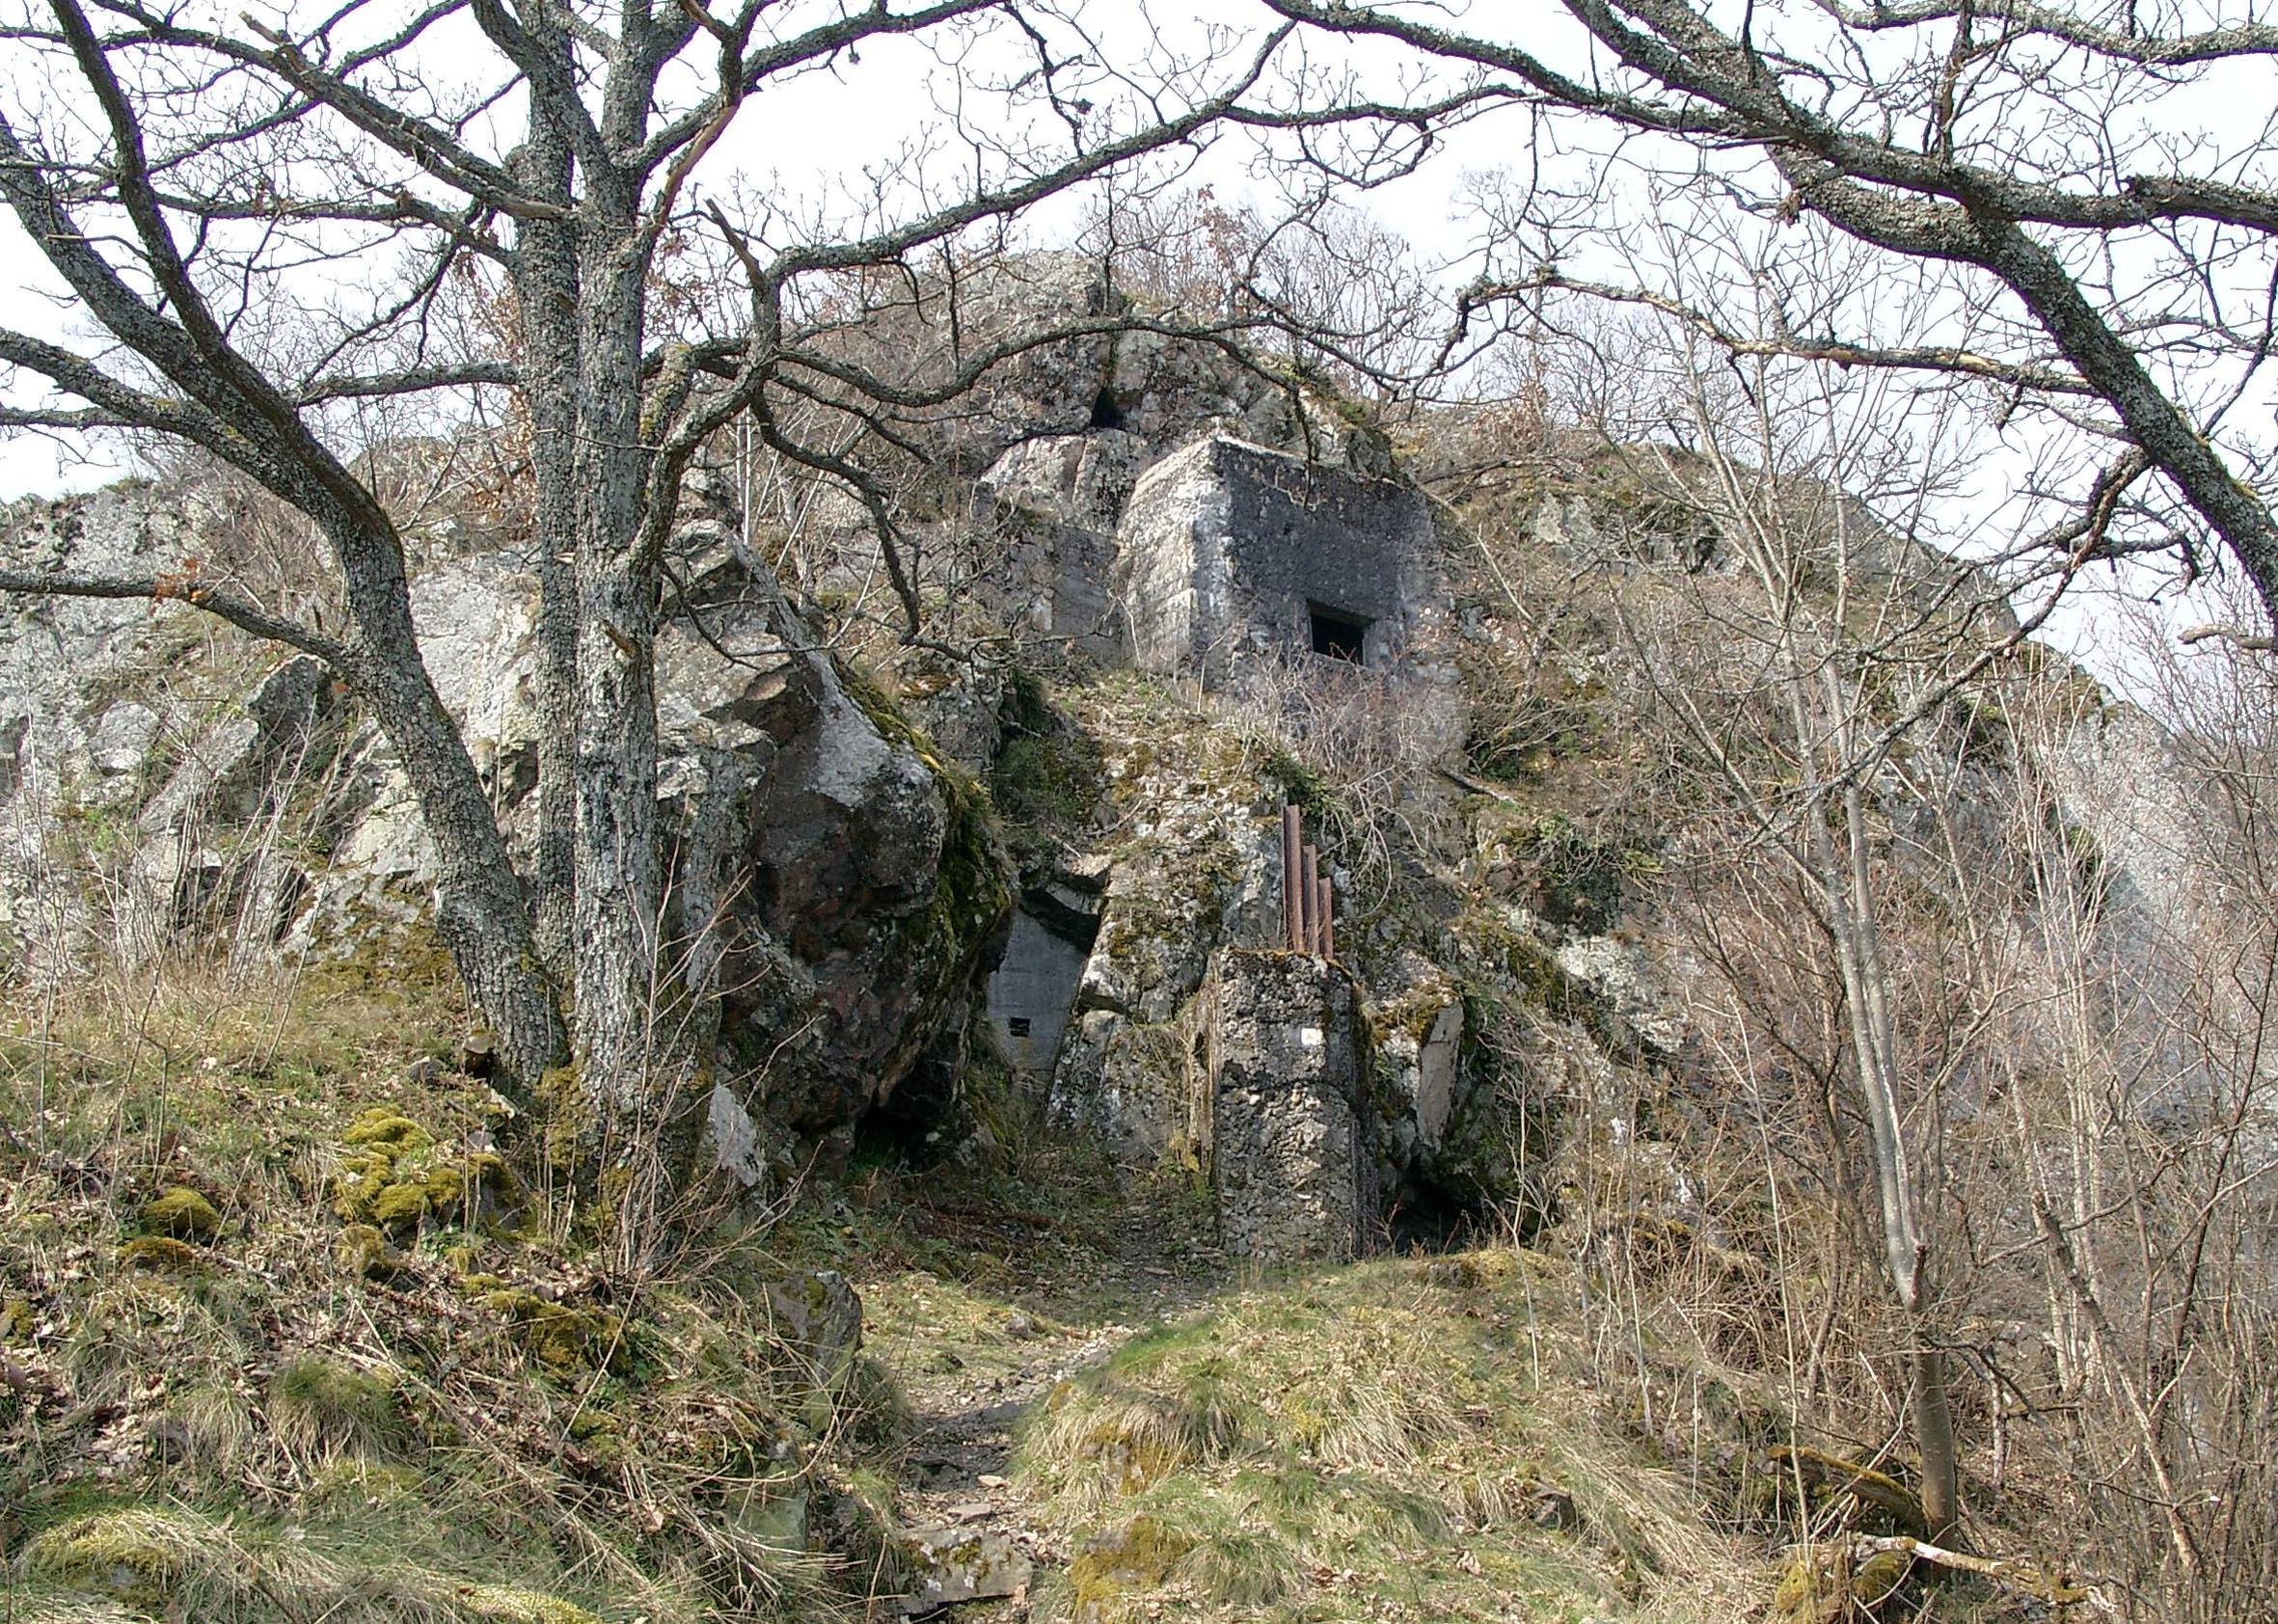 Deutsche Befestigungen am unteren Rehfelsen am Hartmannsweilerkopf